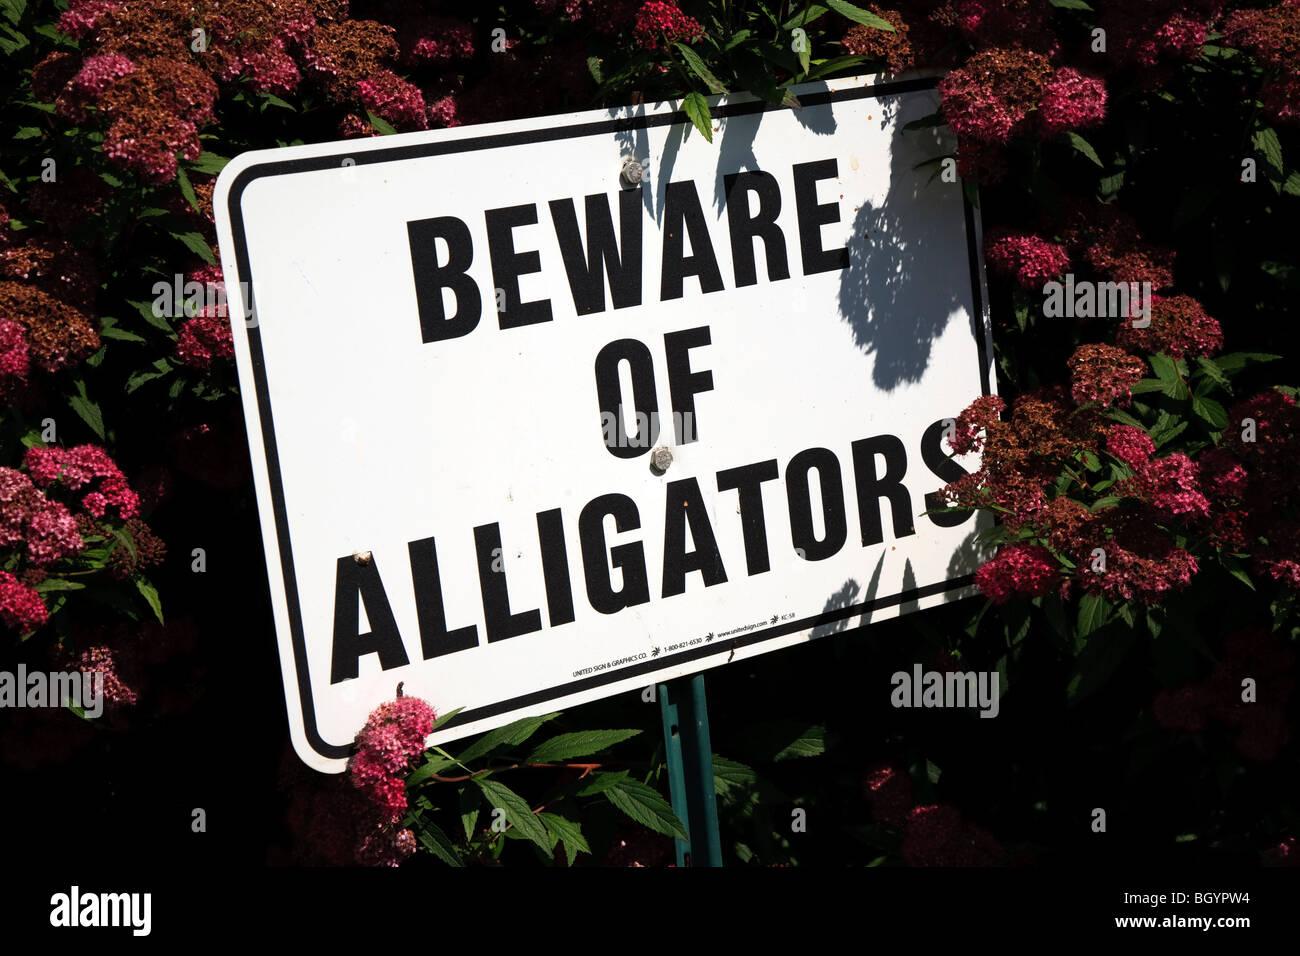 Beware of Alligators sign - Stock Image